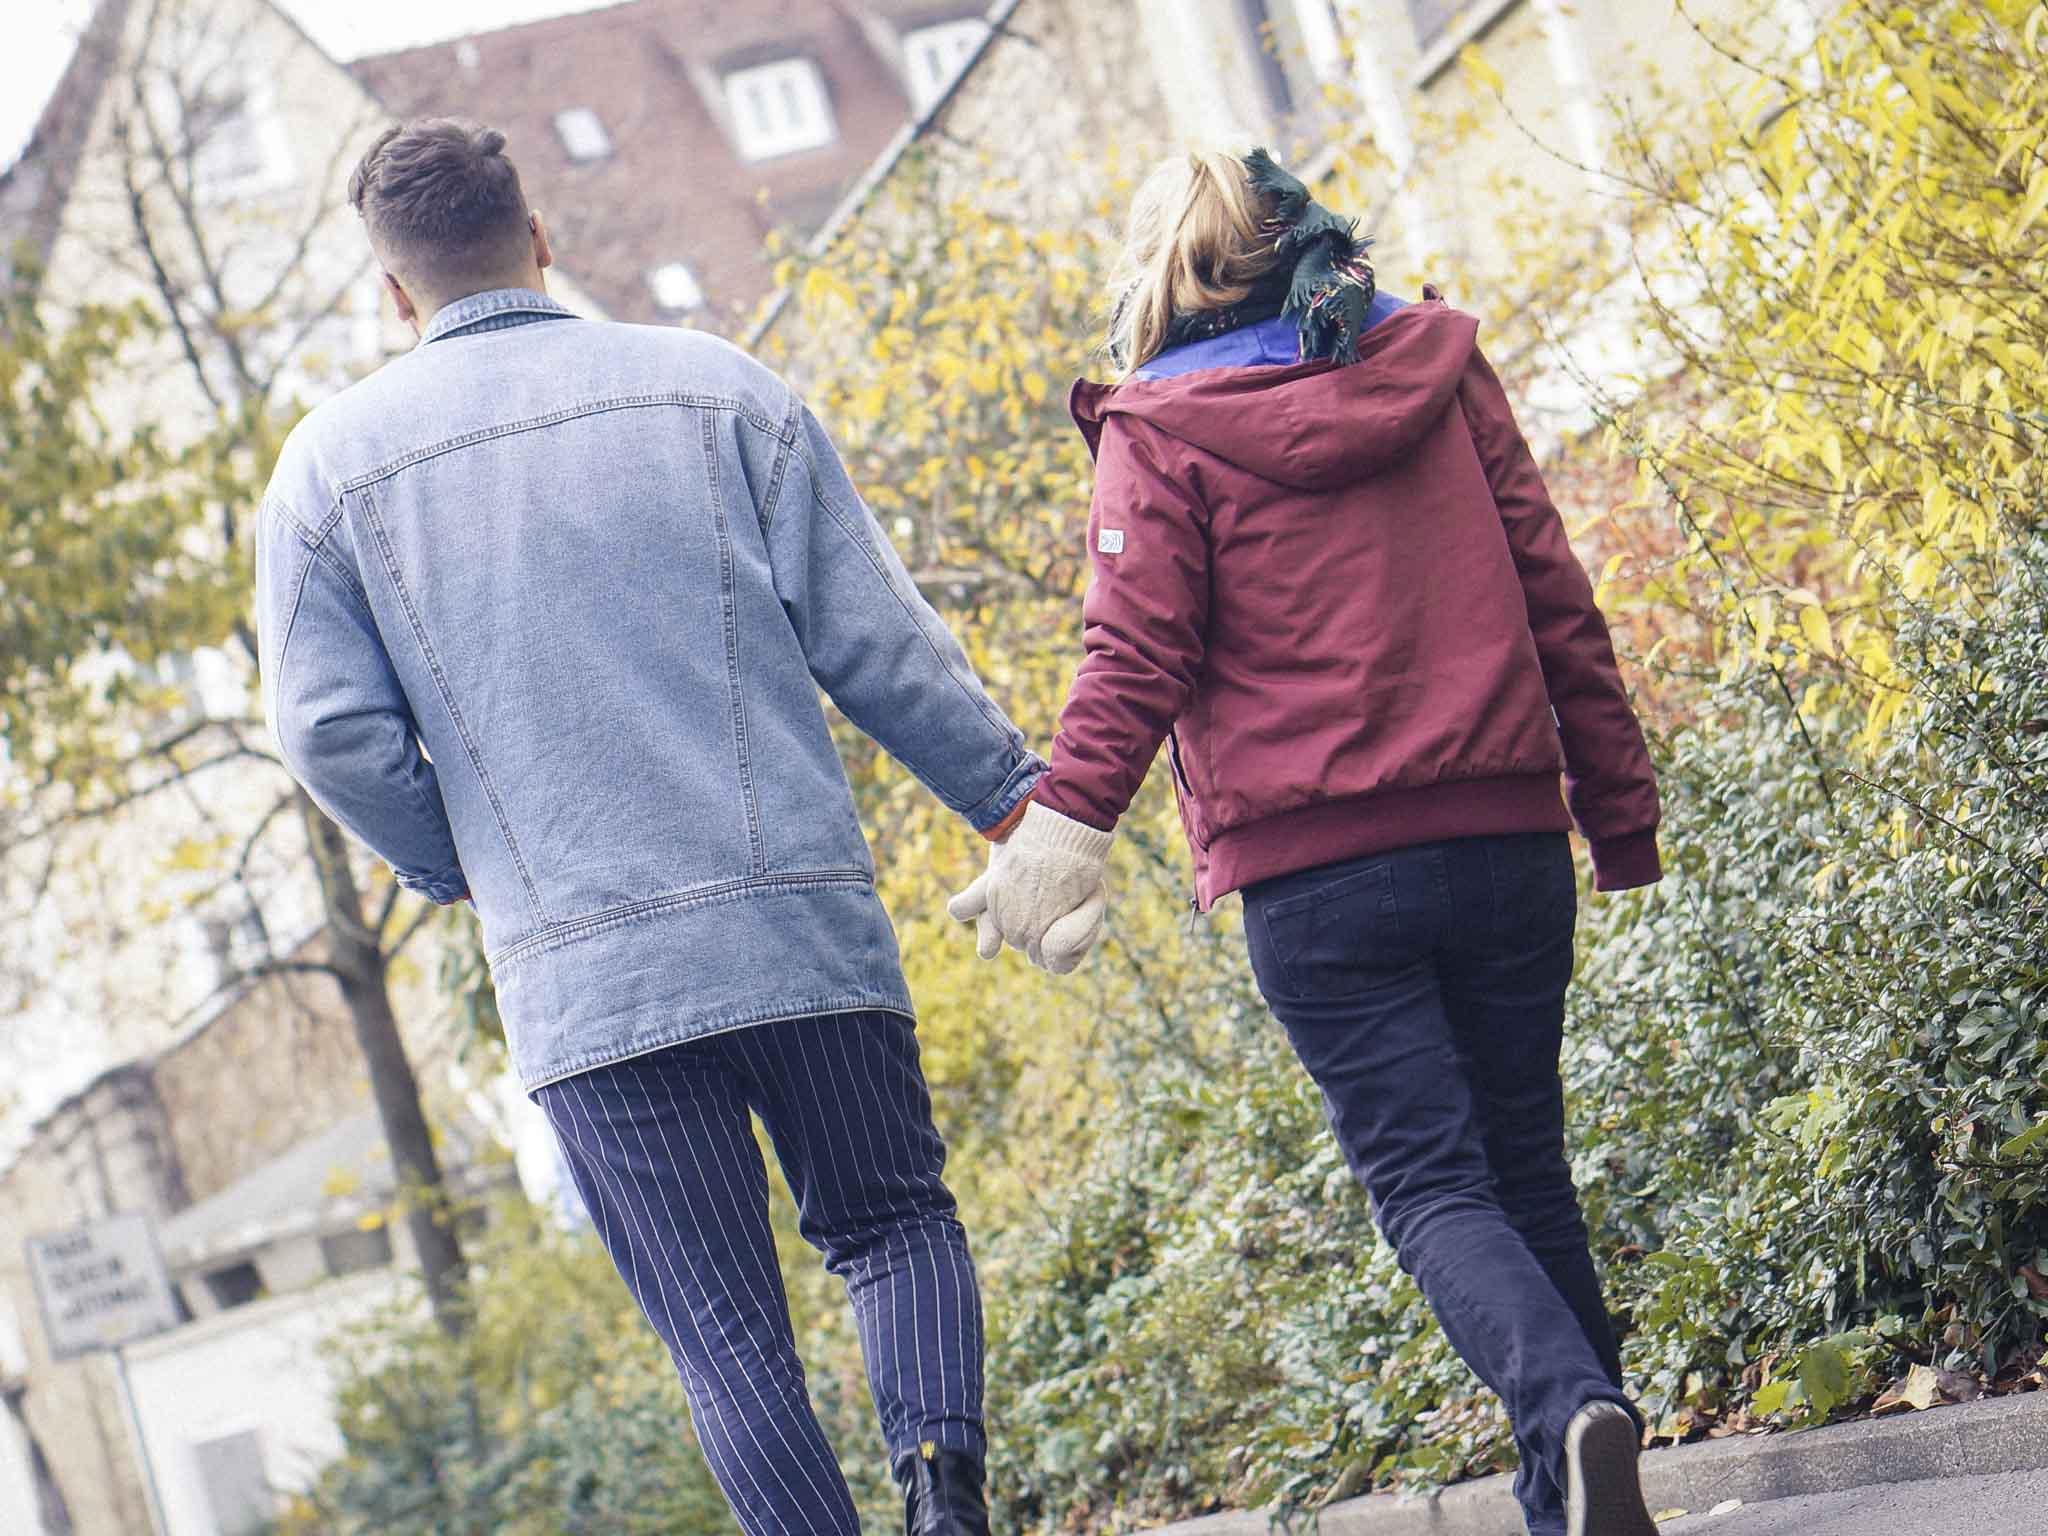 Dating schweinfurt